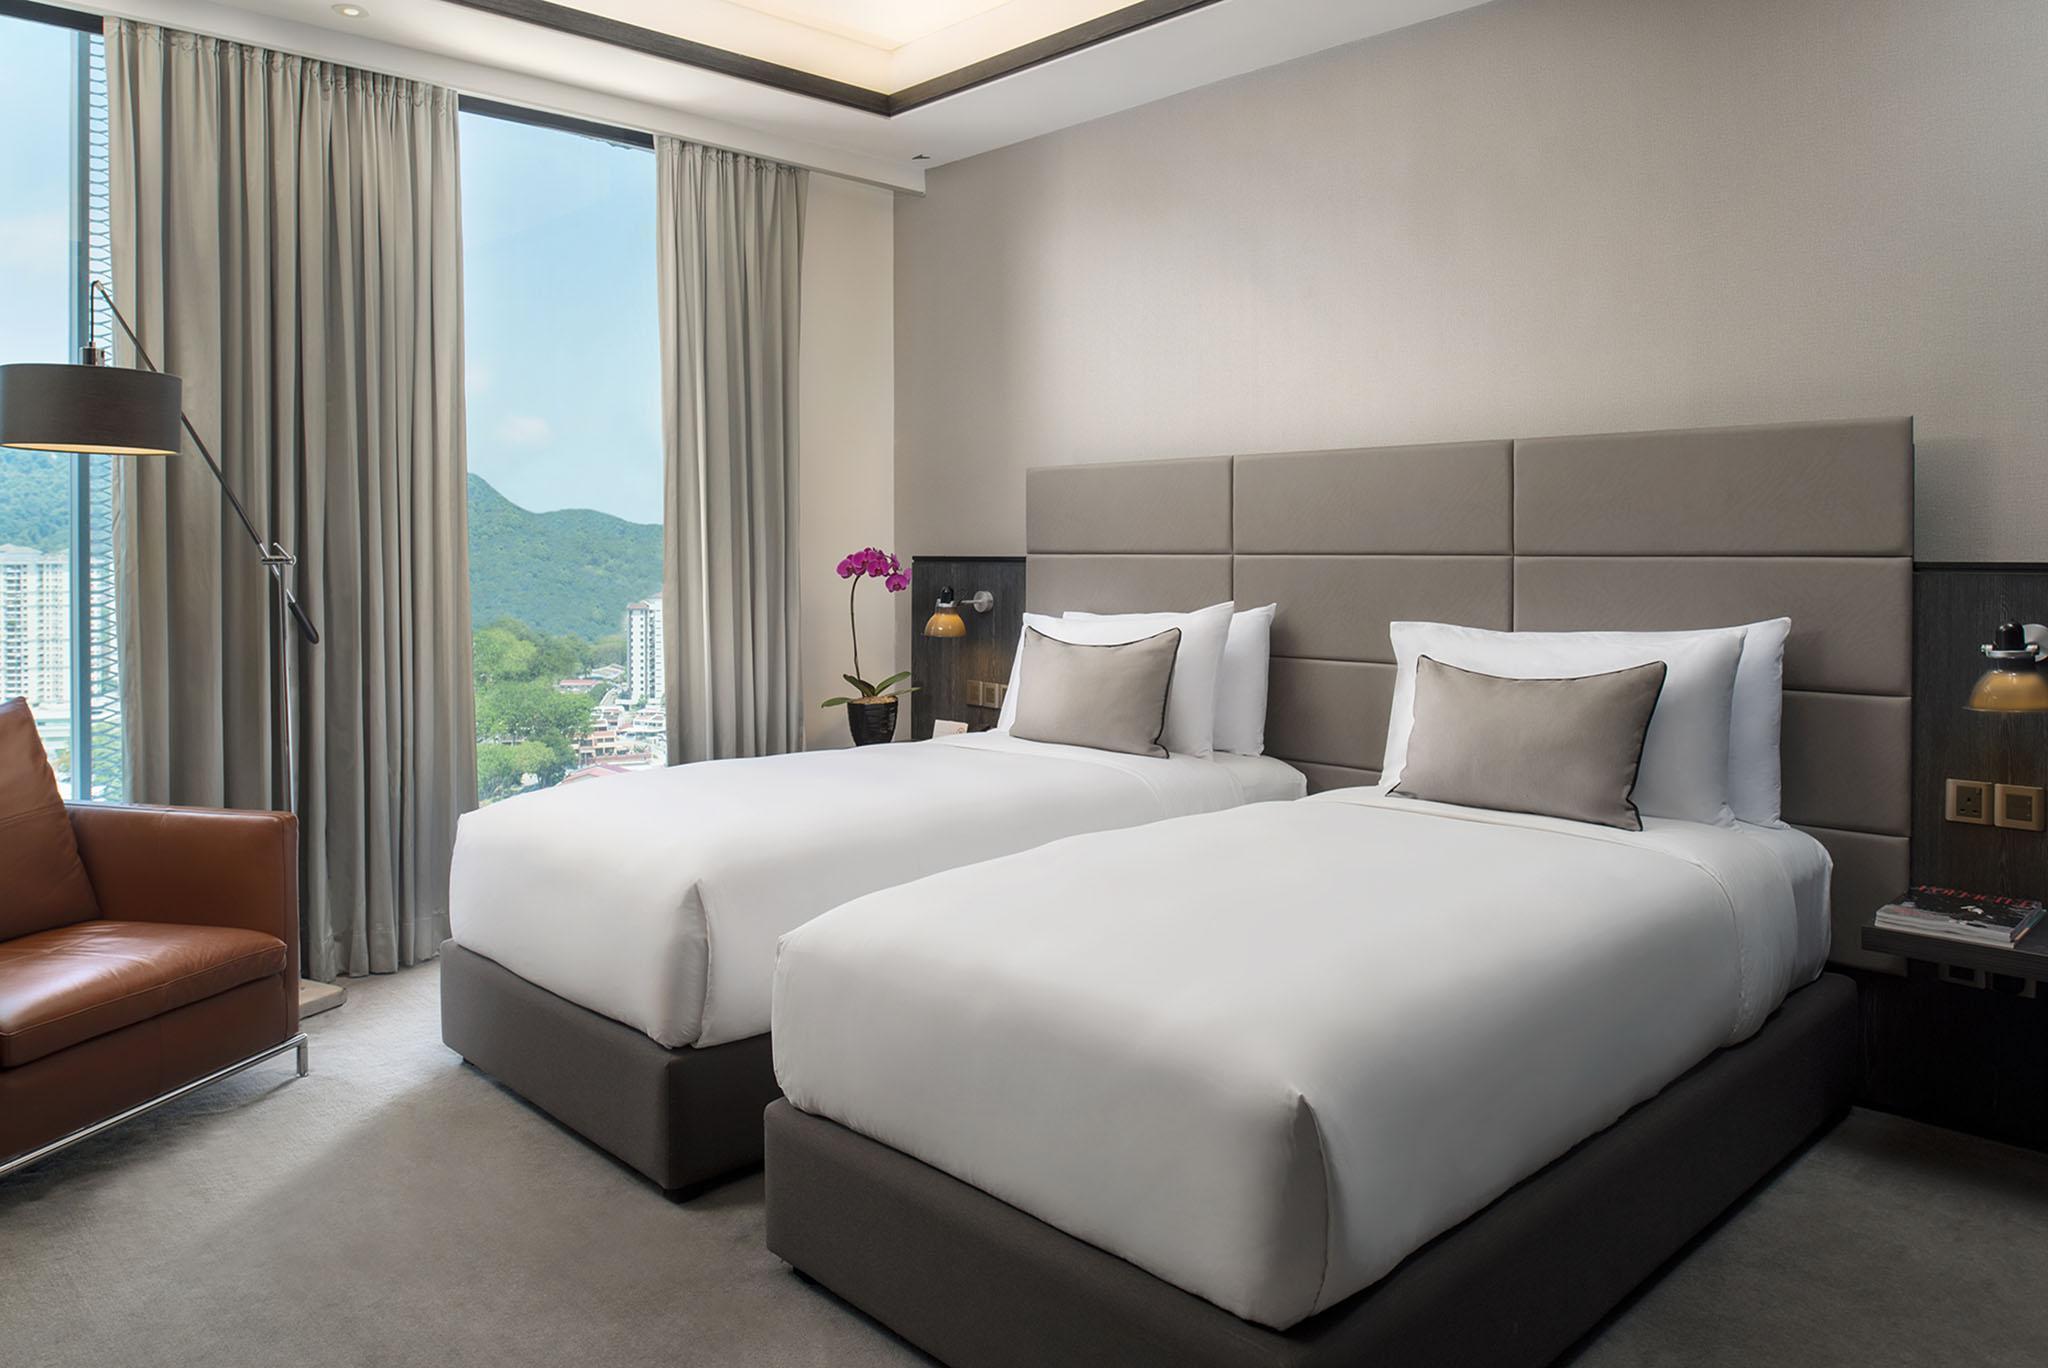 G Hotel Kelawai In Penang Room Deals Photos Reviews Dr Brownamp039s Deluxe Electric Bottle Sterilizer